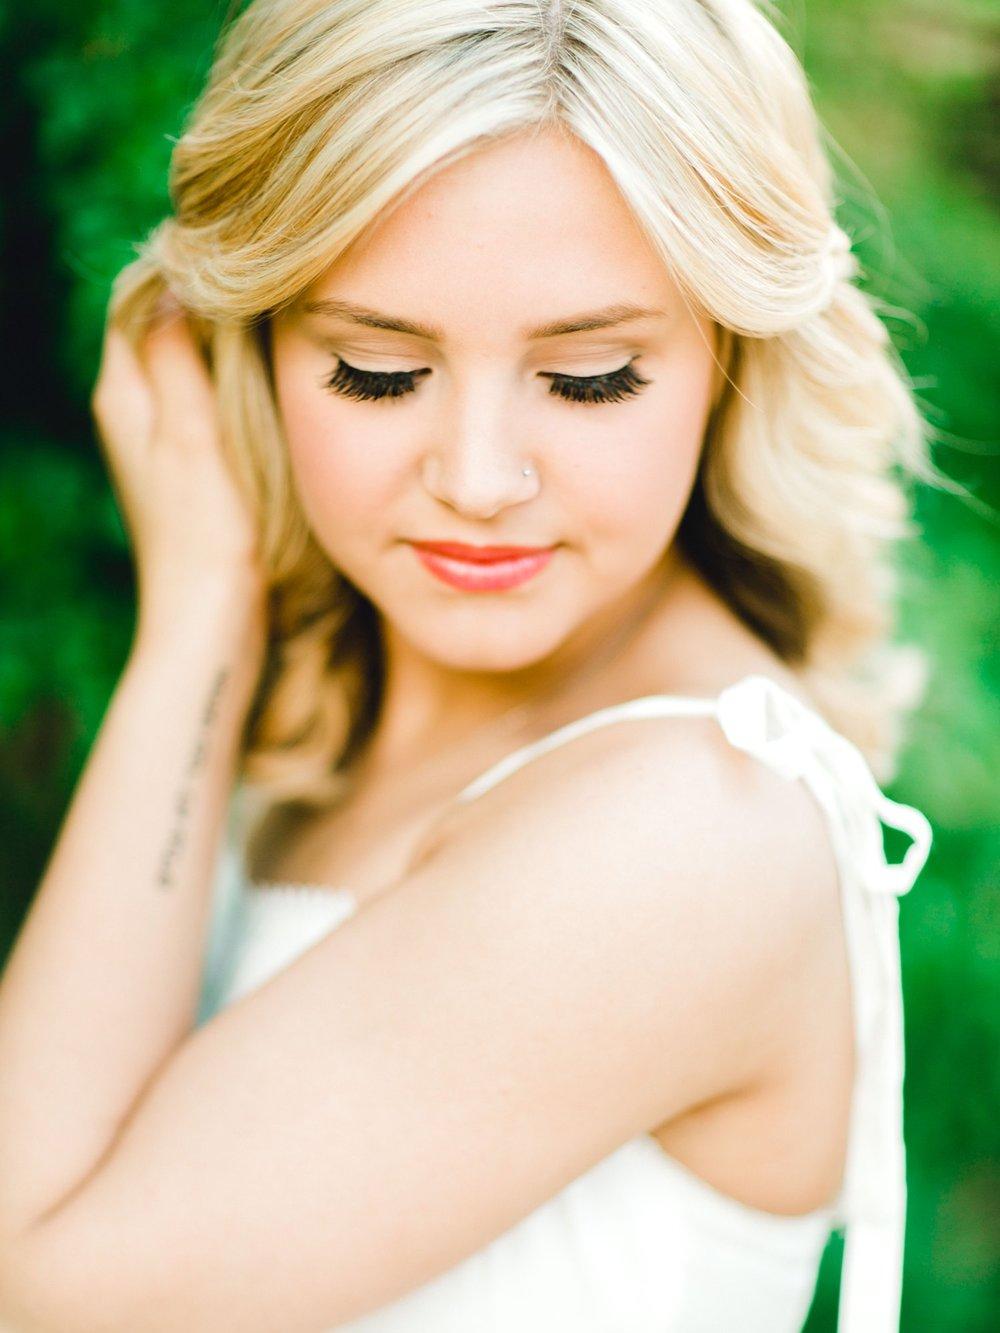 Abigail_Lokey_ALLEEJ_Lubbock_Senior_Photographer0024.jpg